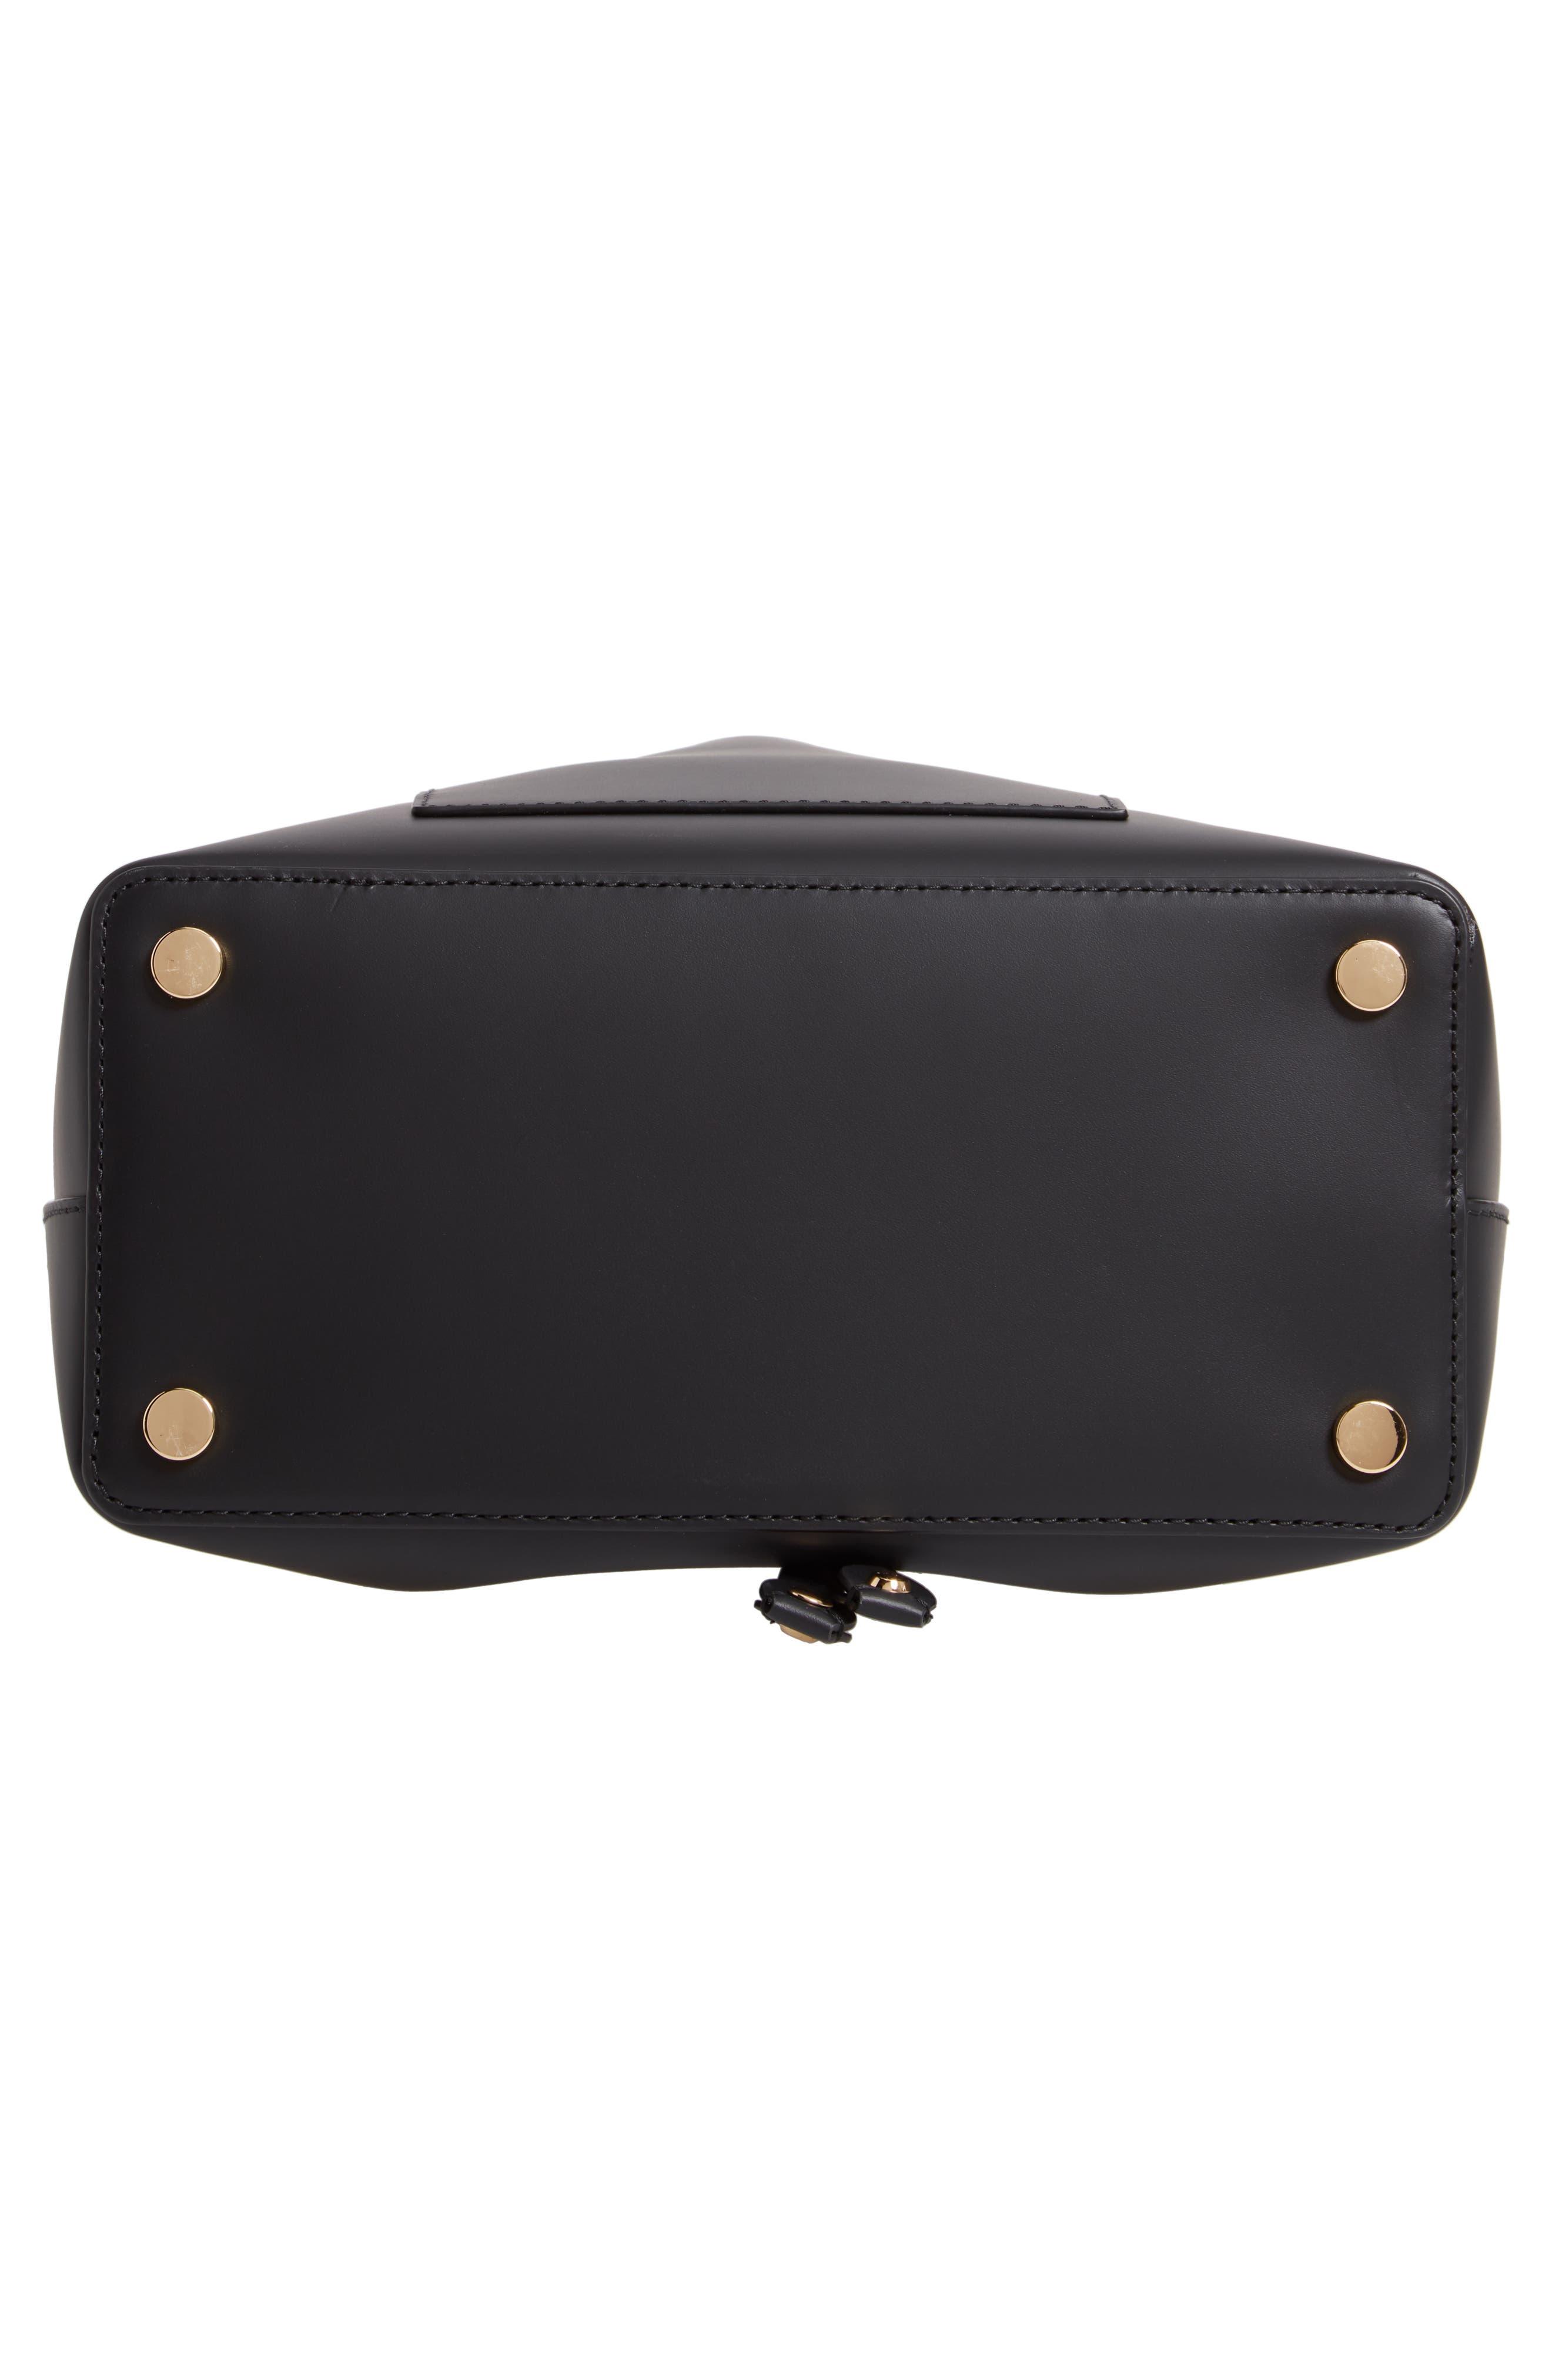 Blakely Leather Bucket Bag,                             Alternate thumbnail 6, color,                             BLACK